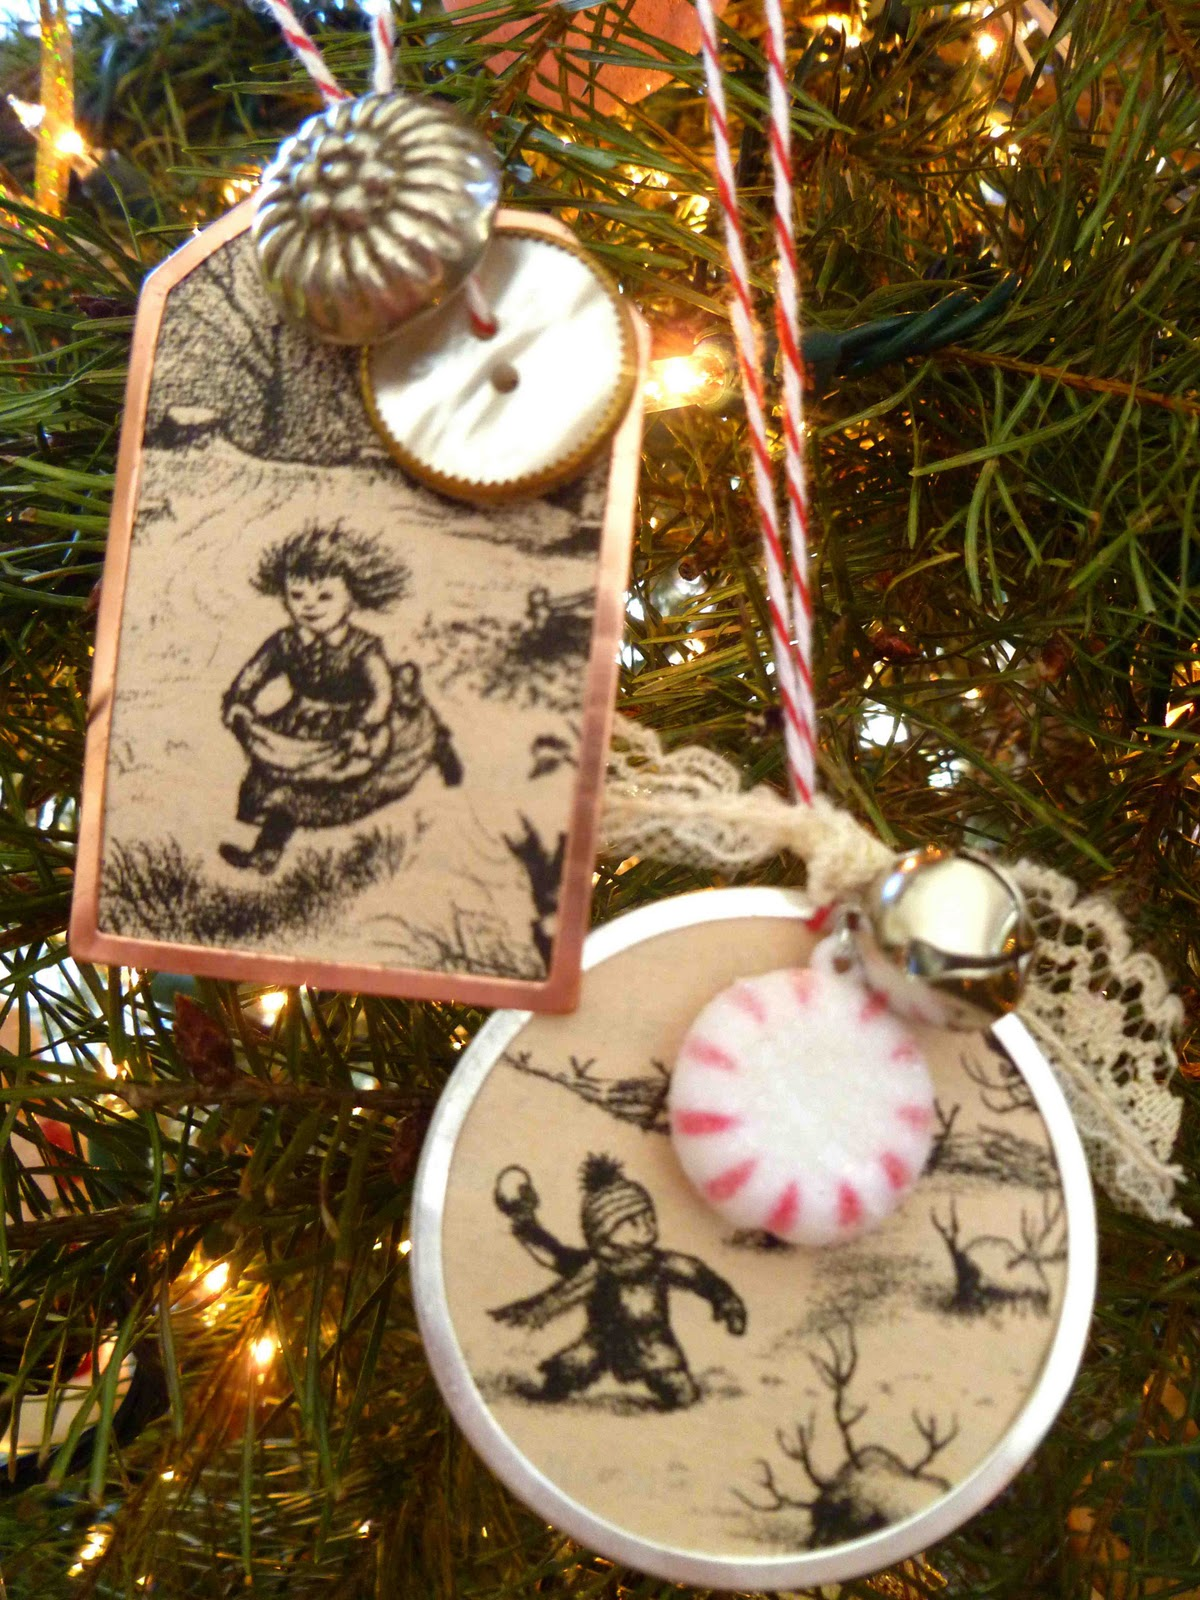 The Happy Honeybee Little House Christmas Stockings